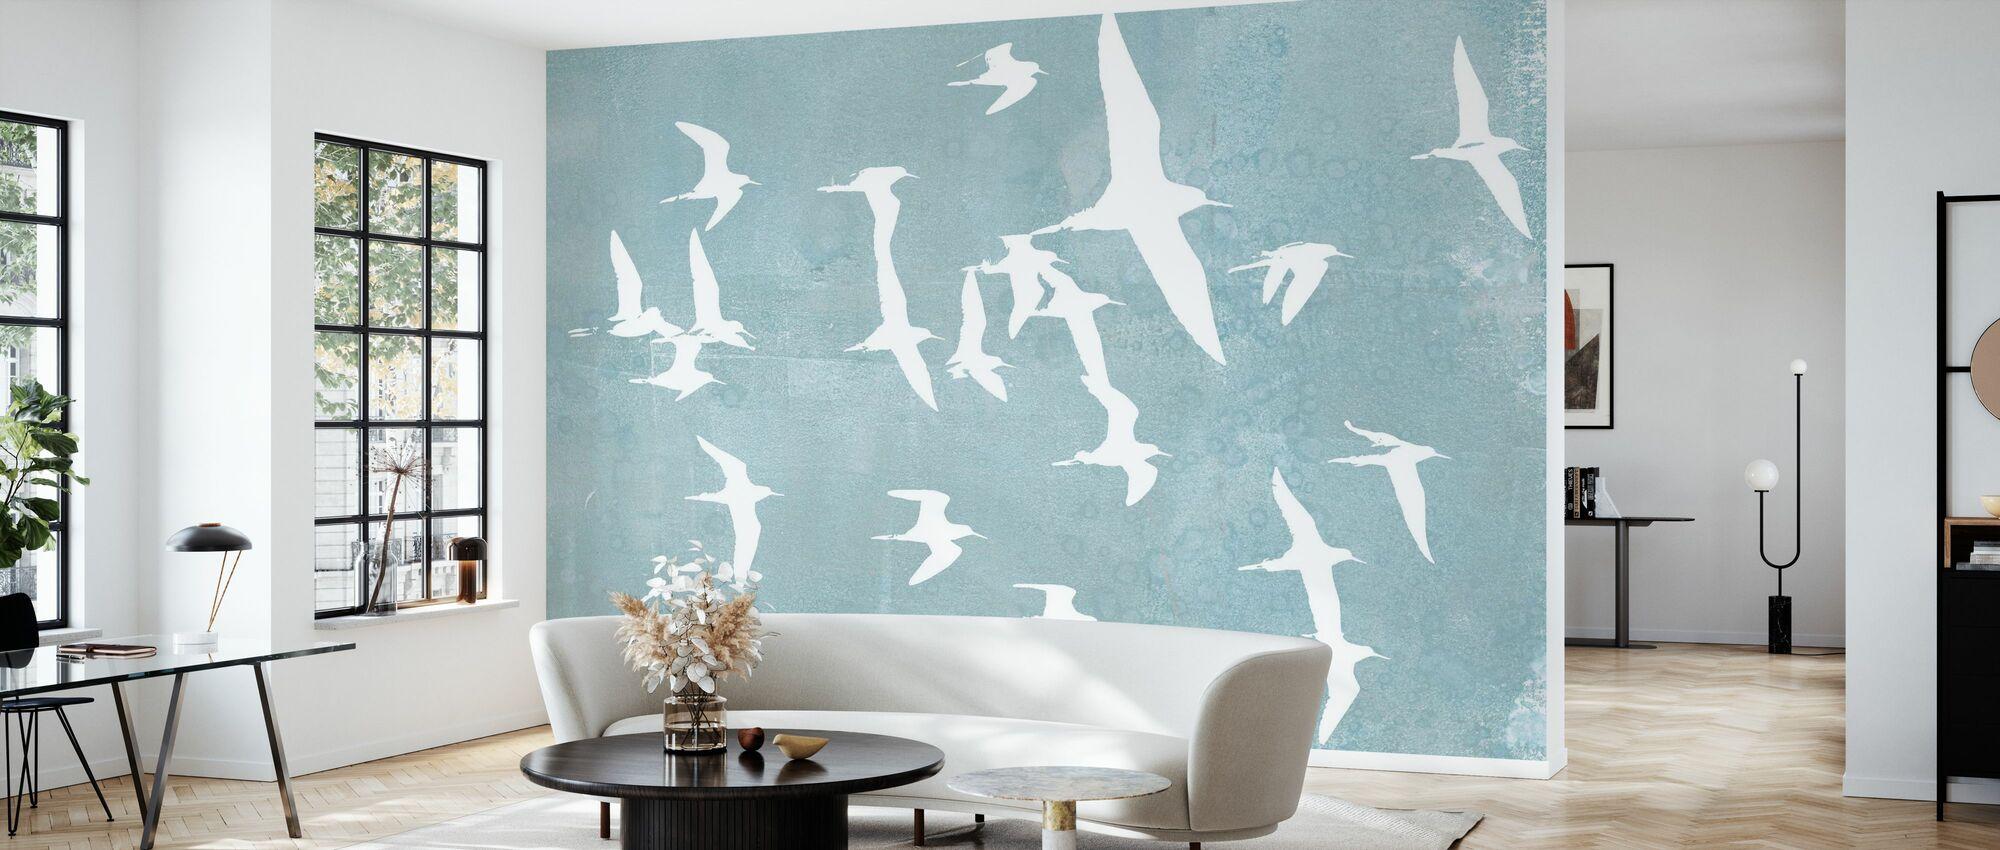 Silhouettes in Flight - Wallpaper - Living Room